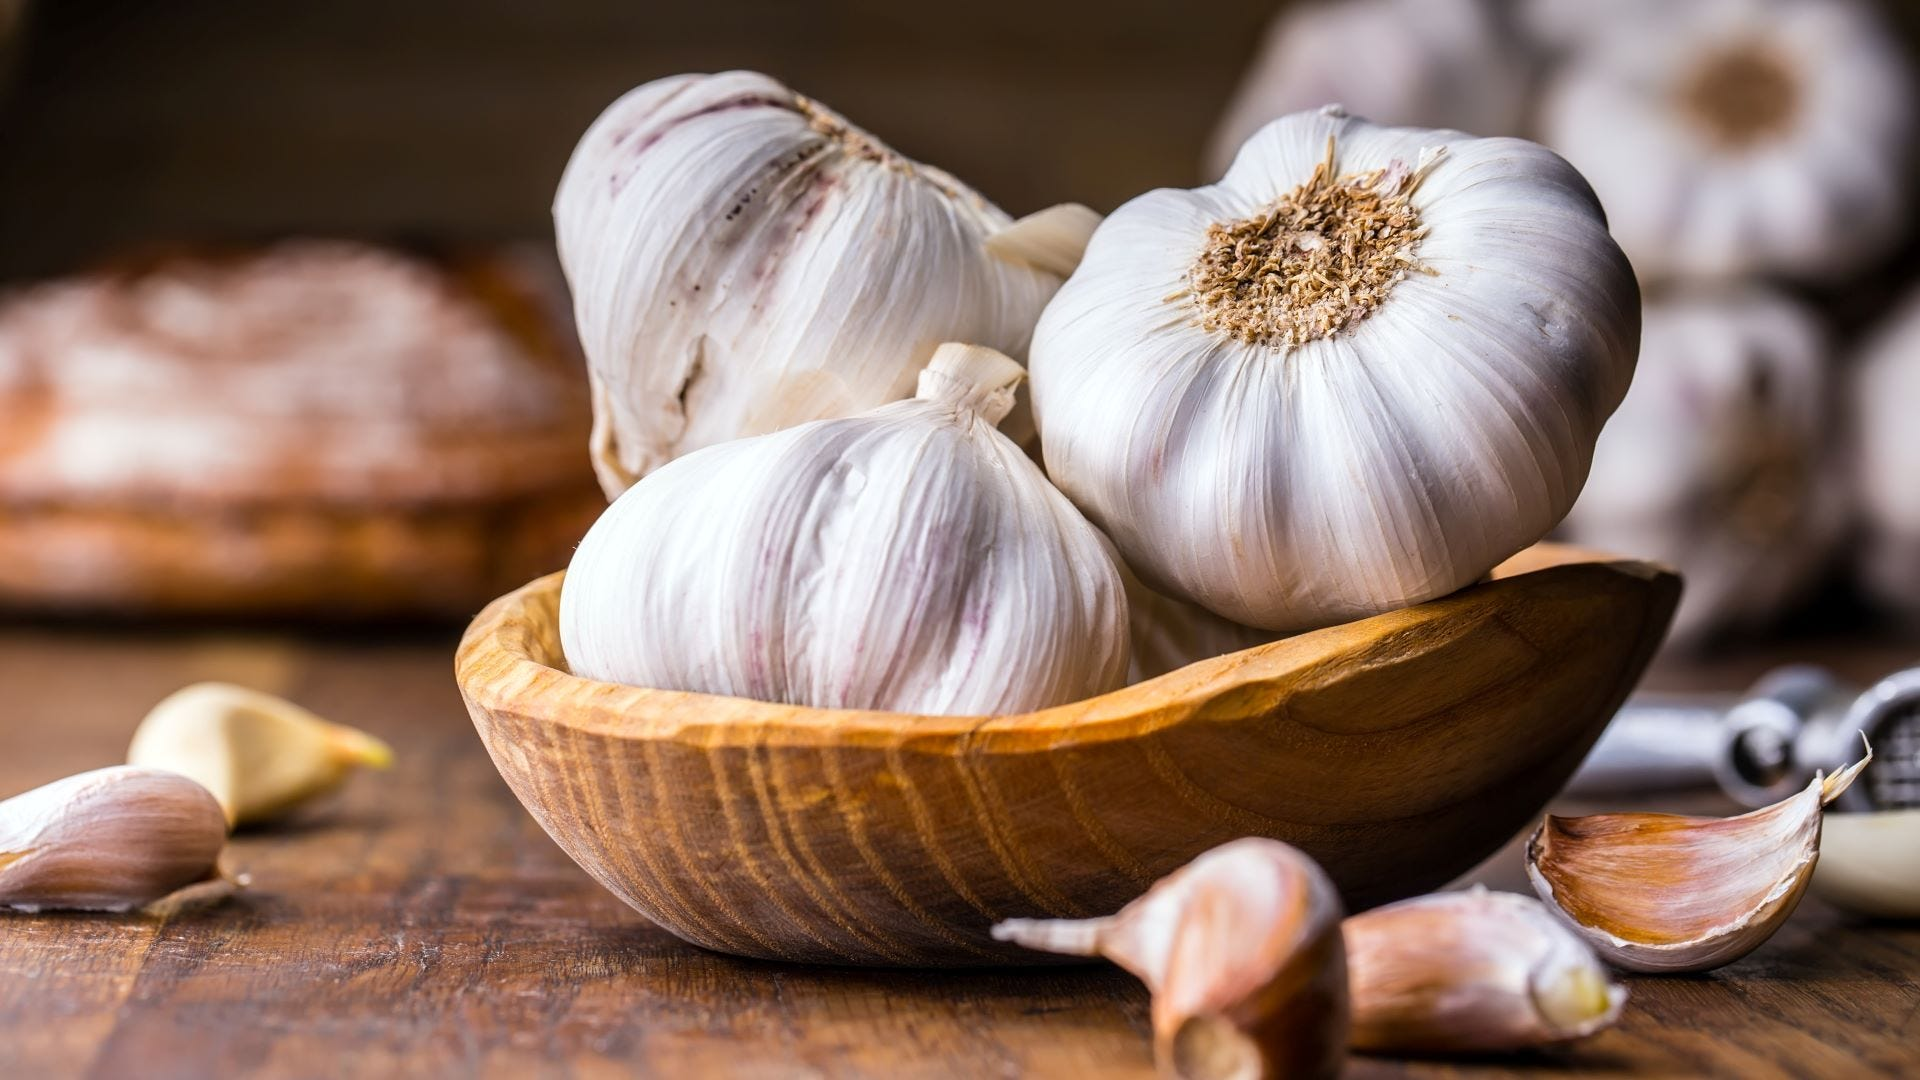 A bowl holding three garlic cloves.